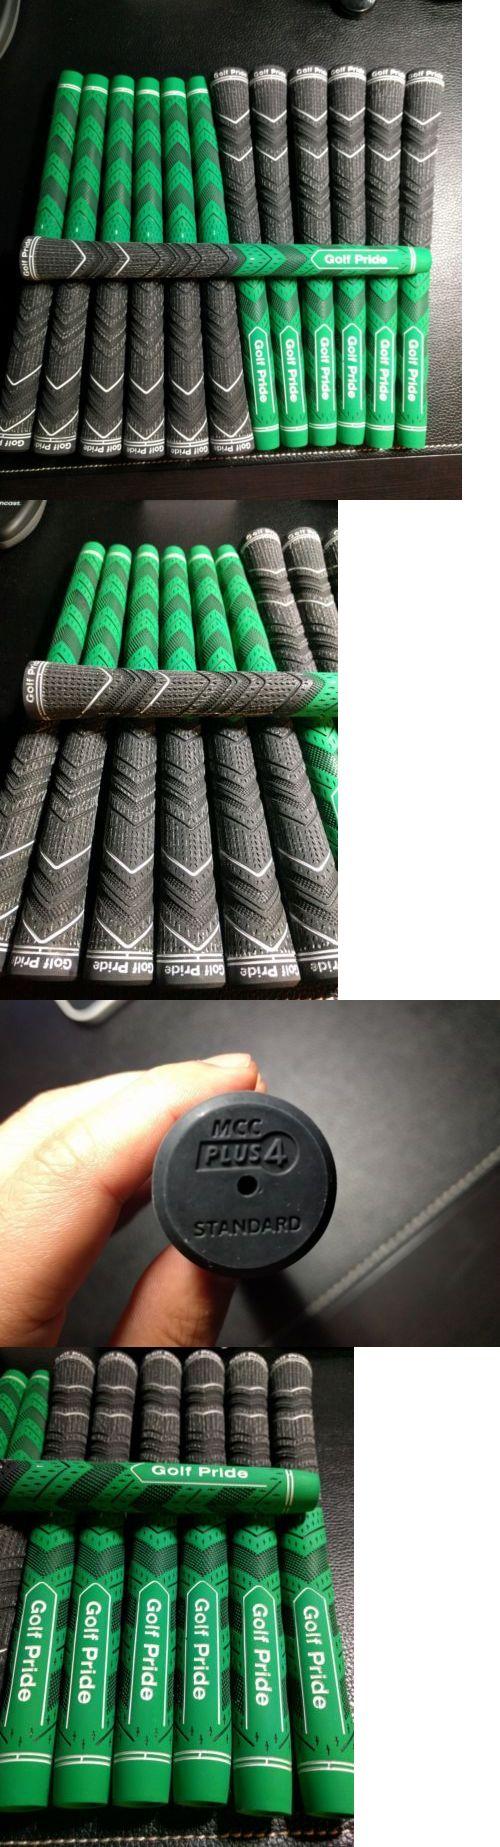 Golf Club Grips 47324: New! 13X Golf Pride Mcc Plus 4 Multicompound Green Black .600 Standard Set -> BUY IT NOW ONLY: $93.99 on eBay!